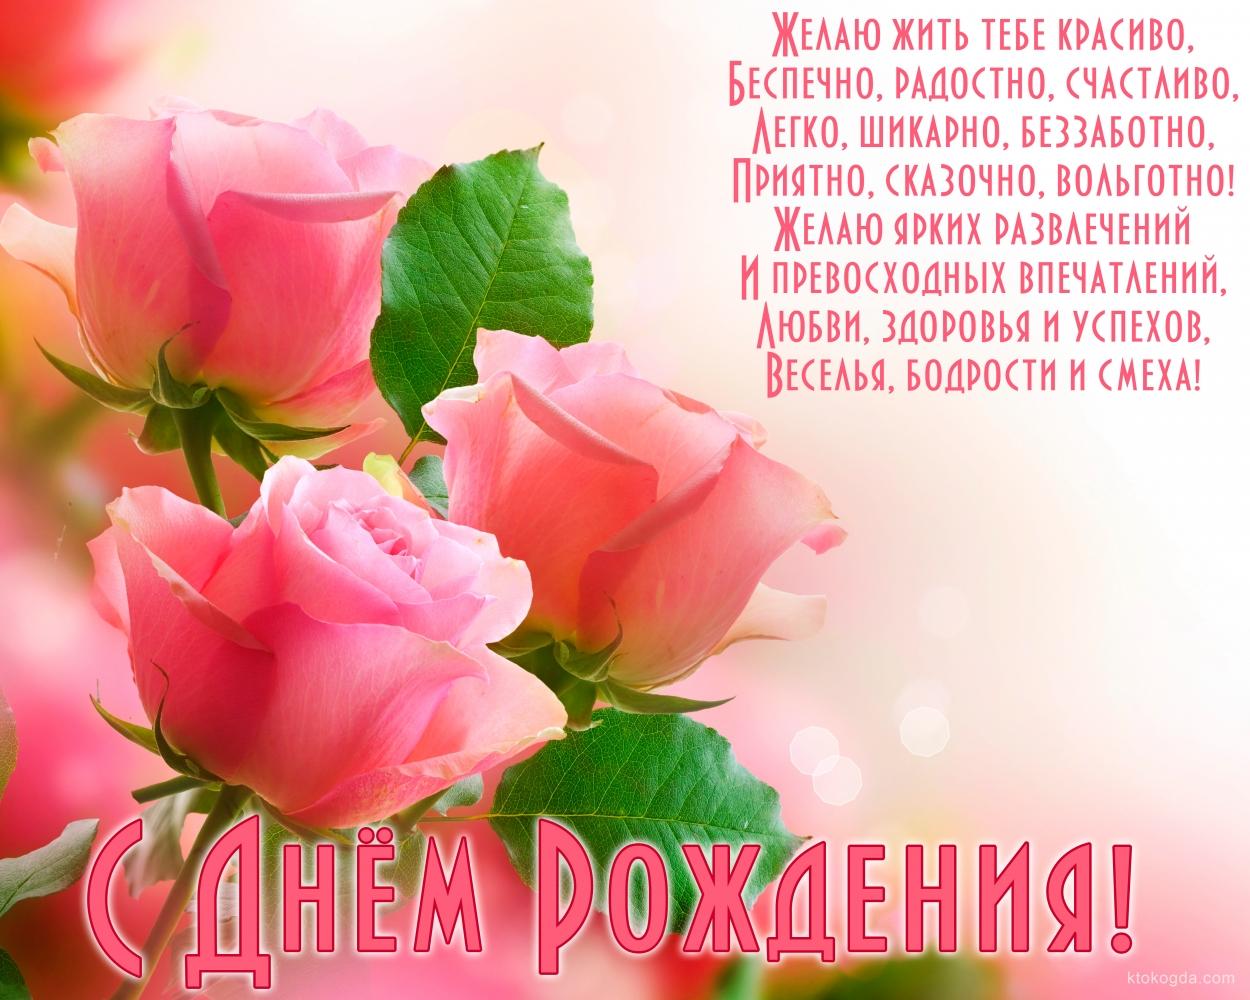 http://s0.tochka.net/cards/images/orig_bf04bad6657e5545e1c65f7d096dea69.jpg